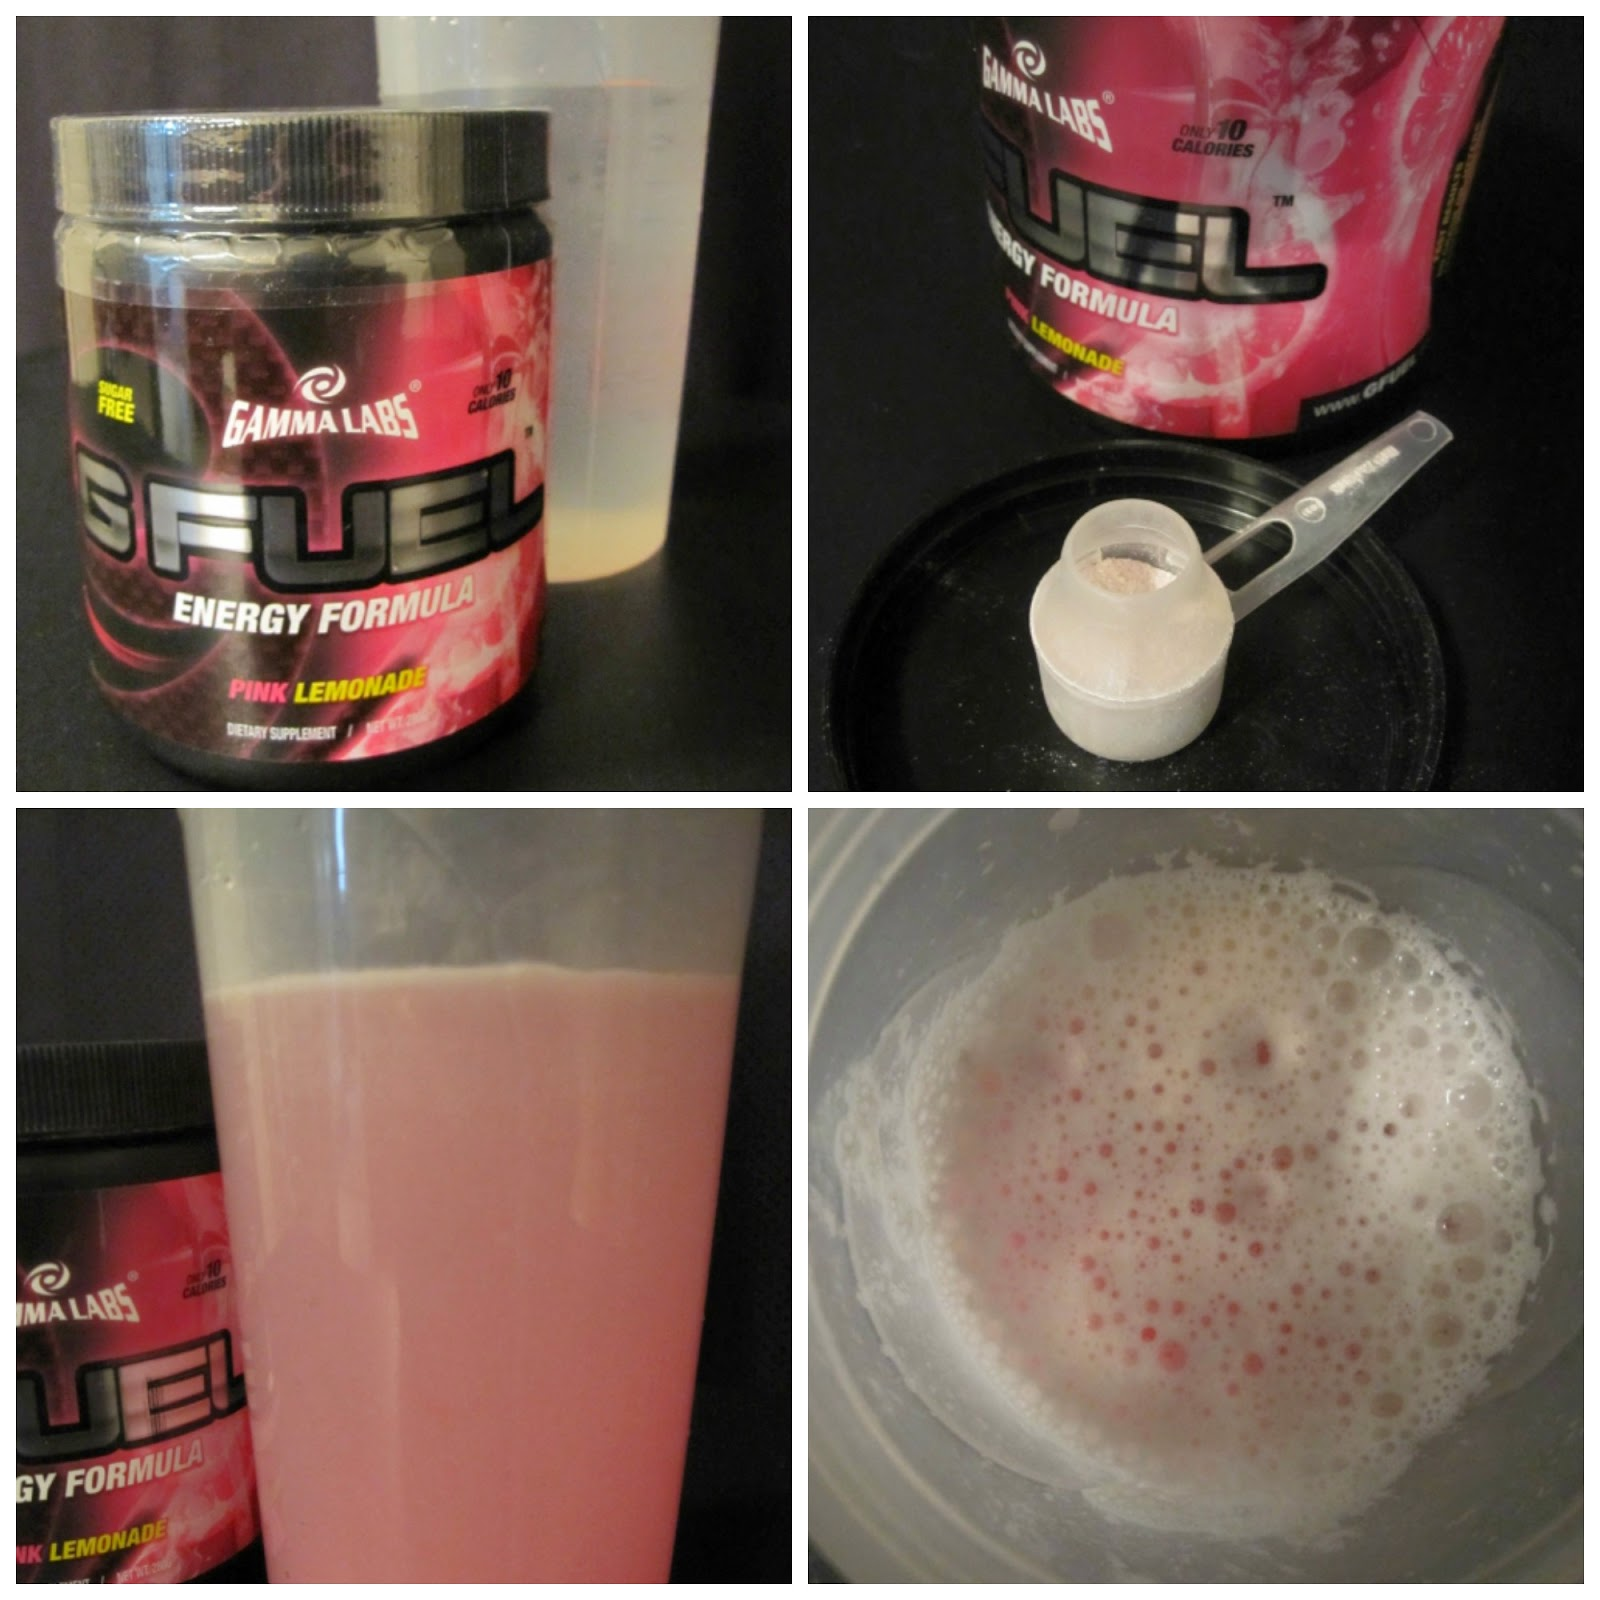 Thefugitiveinc Betterthanlife Reviews Pink Lemonade G Fuel